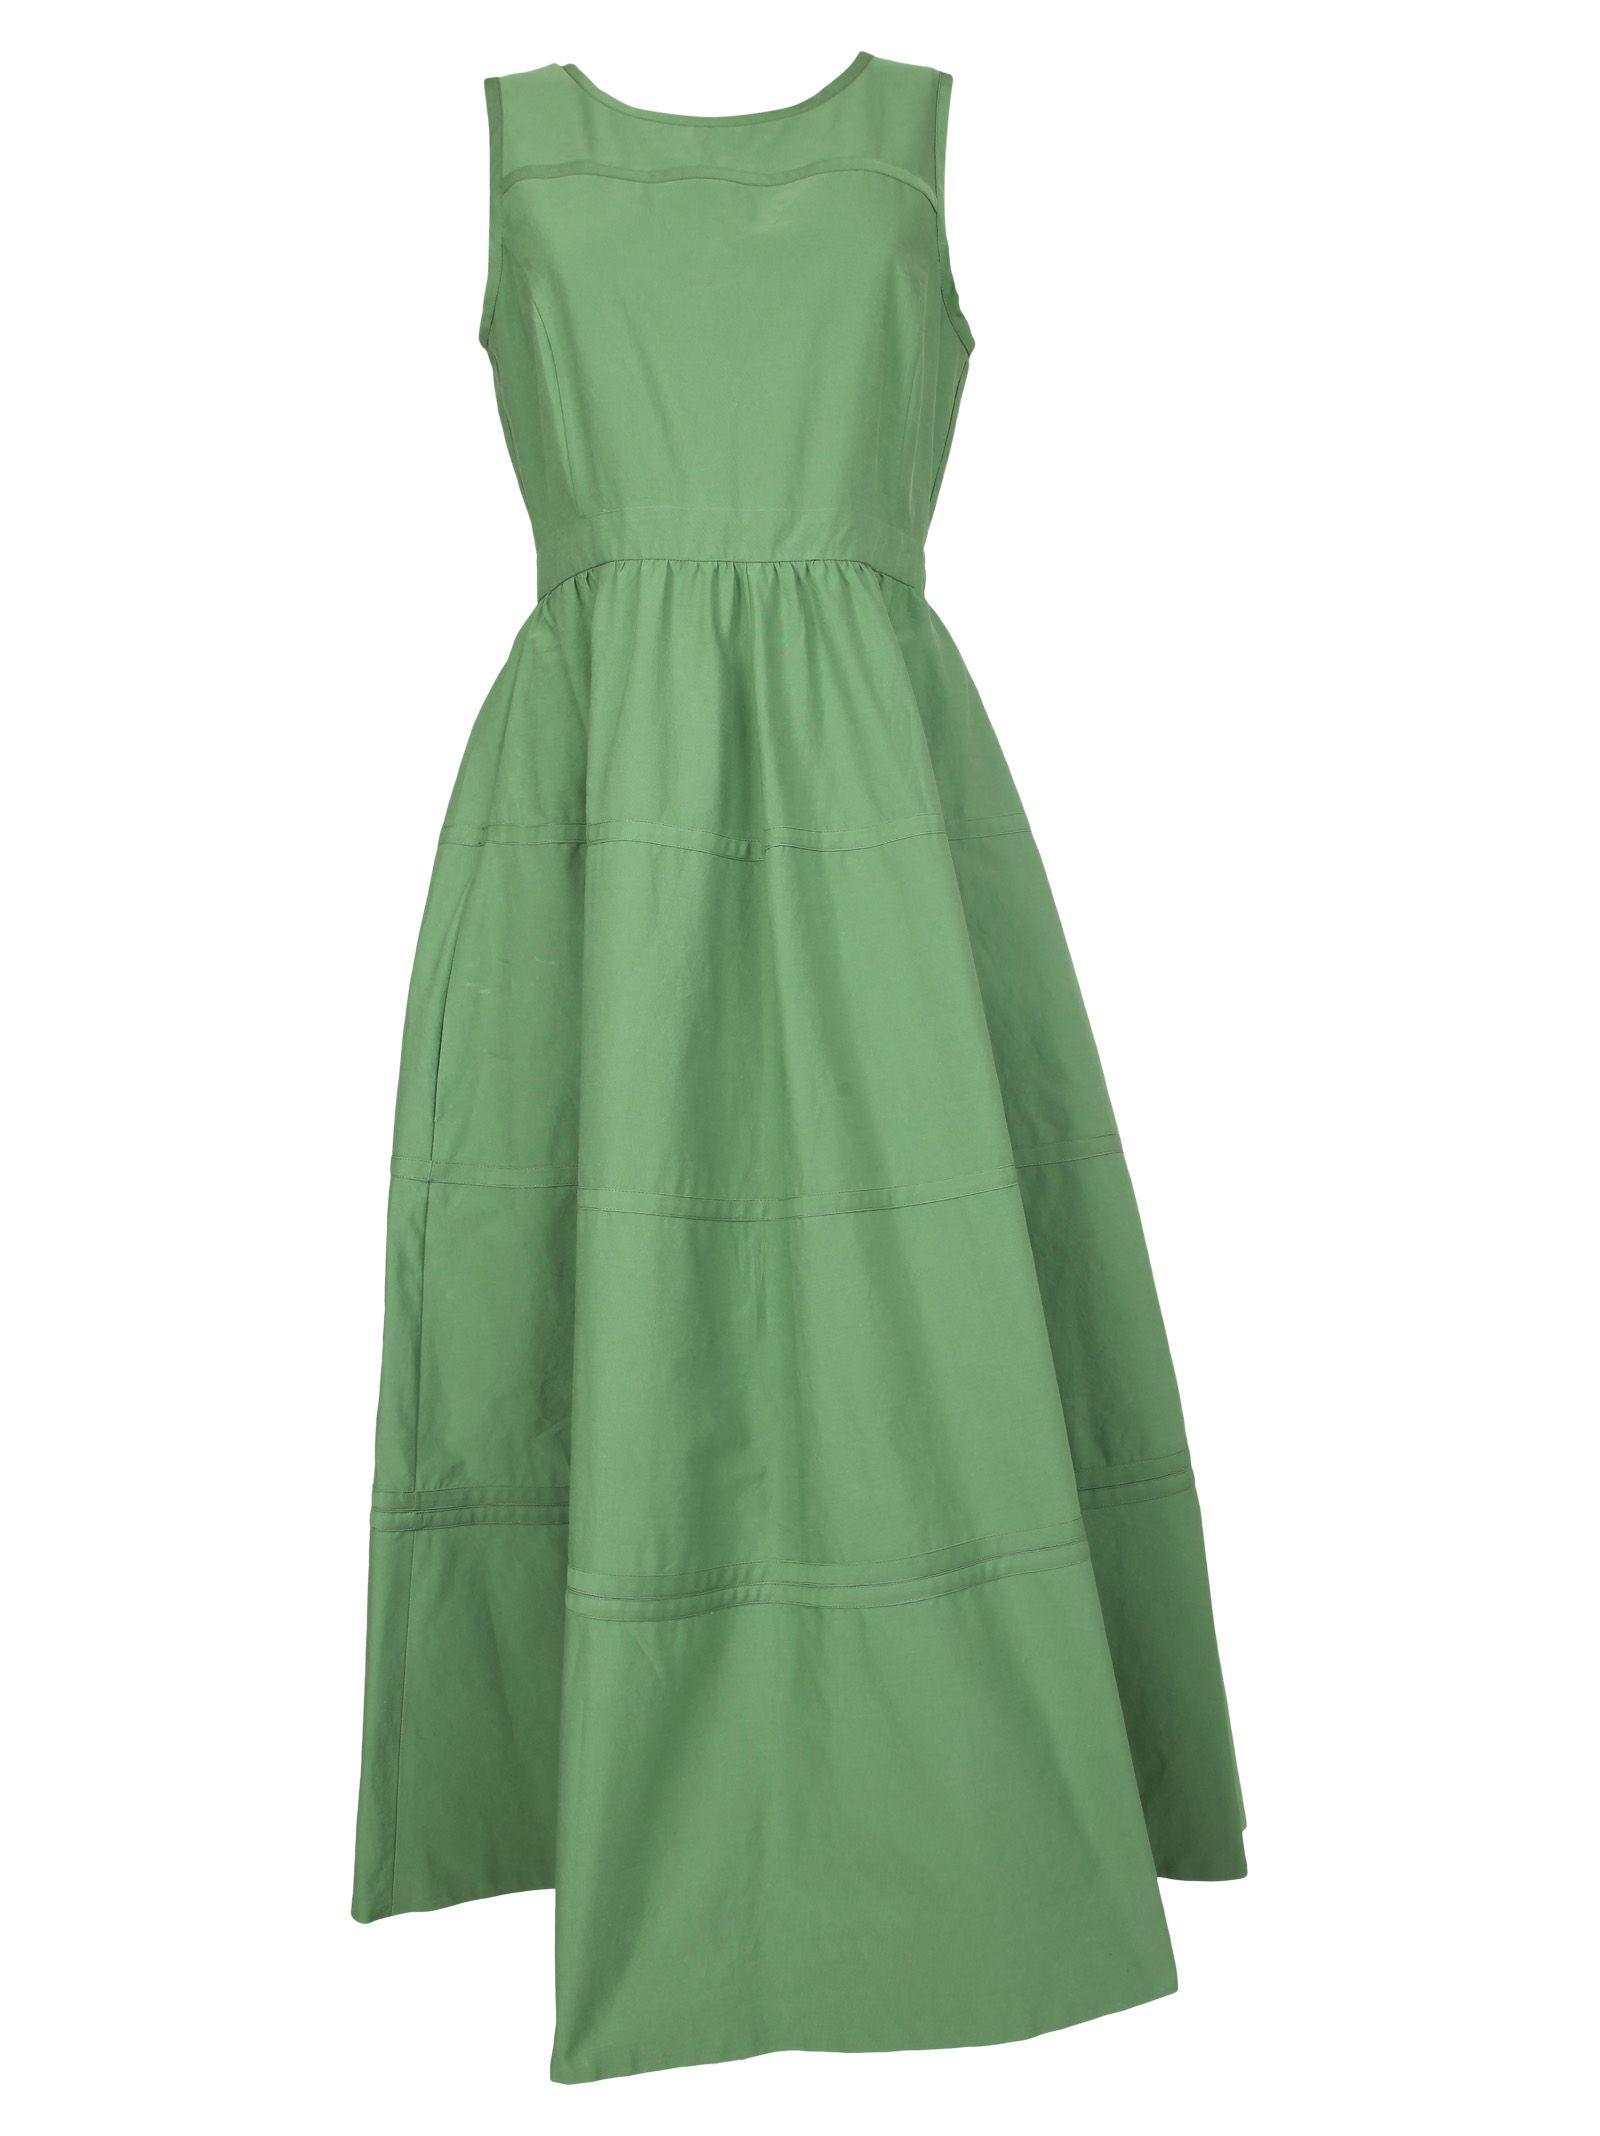 Bottega Veneta Sleeveless Dress